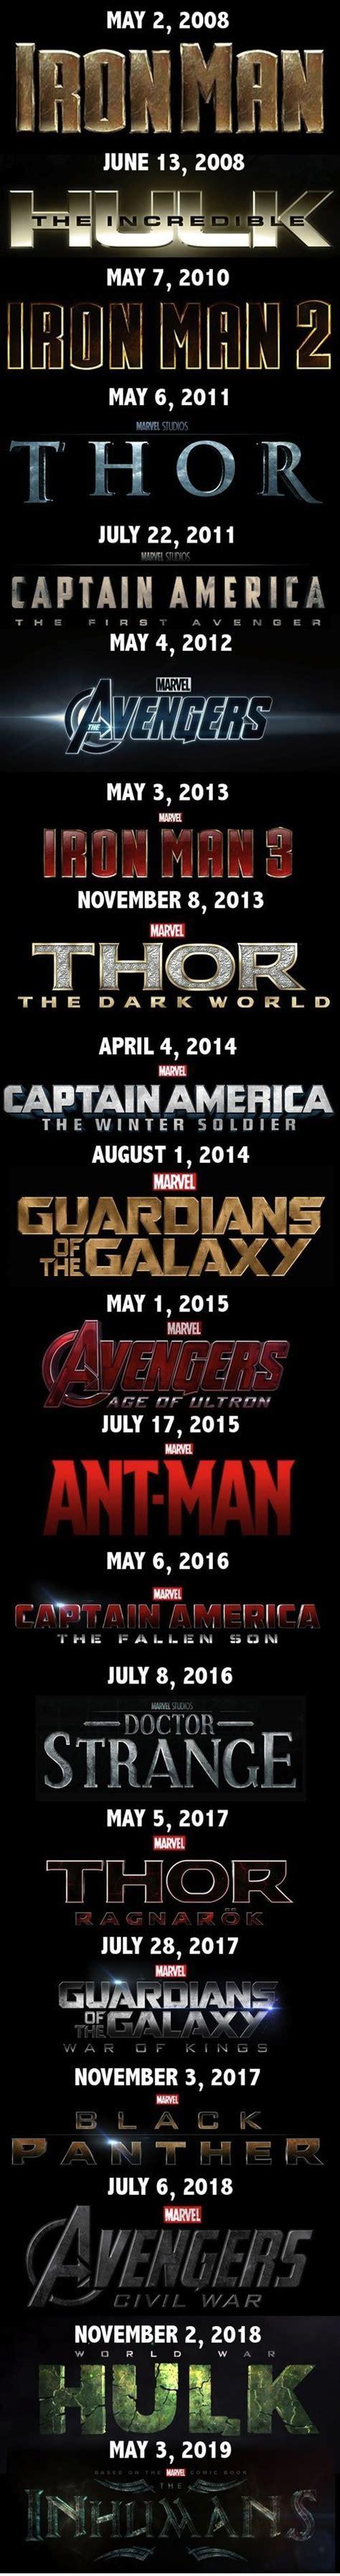 marvel movies order 9gag 25 best ideas about marvel movies on pinterest marvel